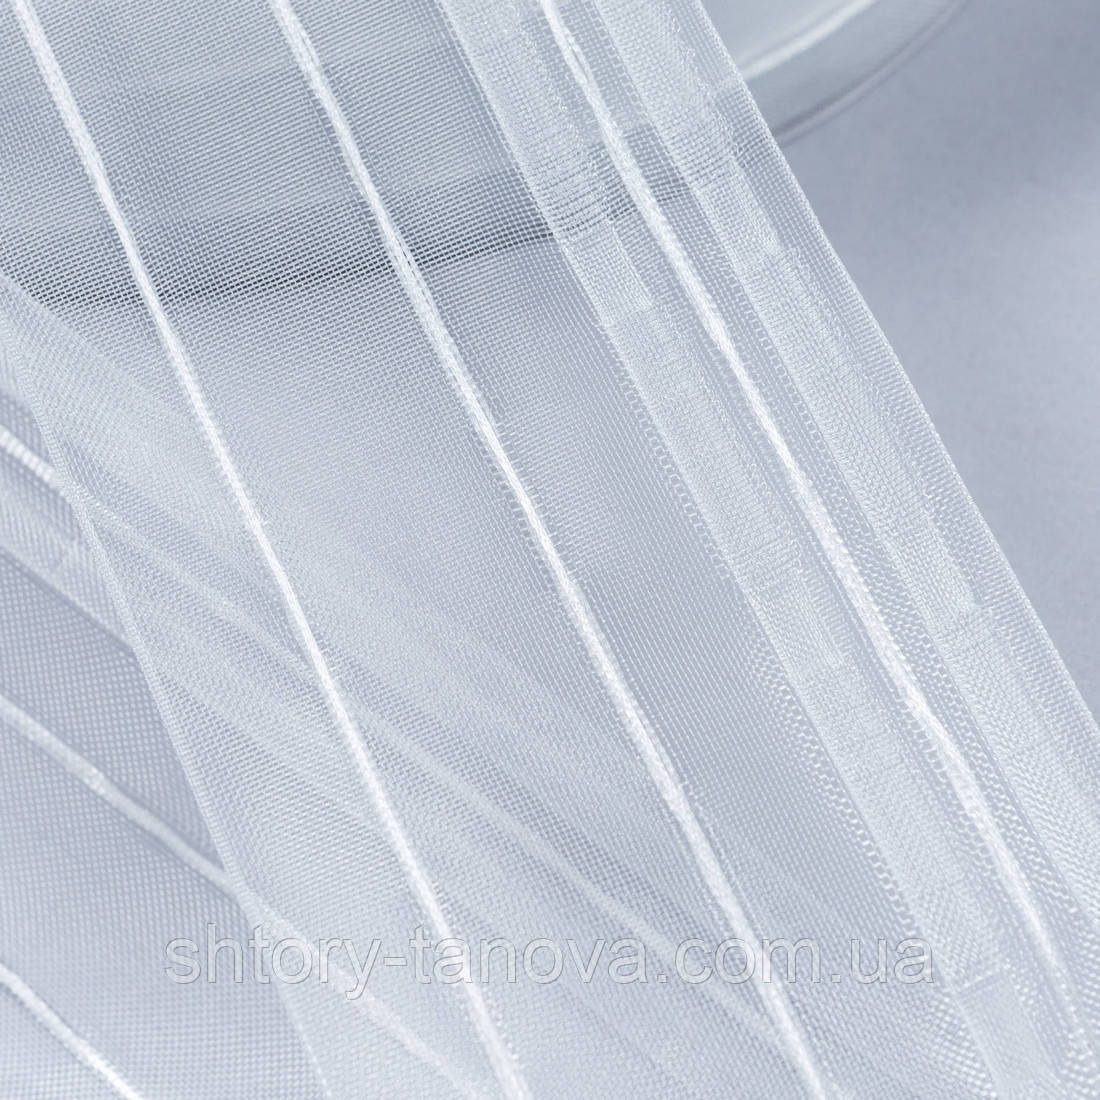 Тесьма шторная к-1:2 100мм/100м прозрачная равномерная